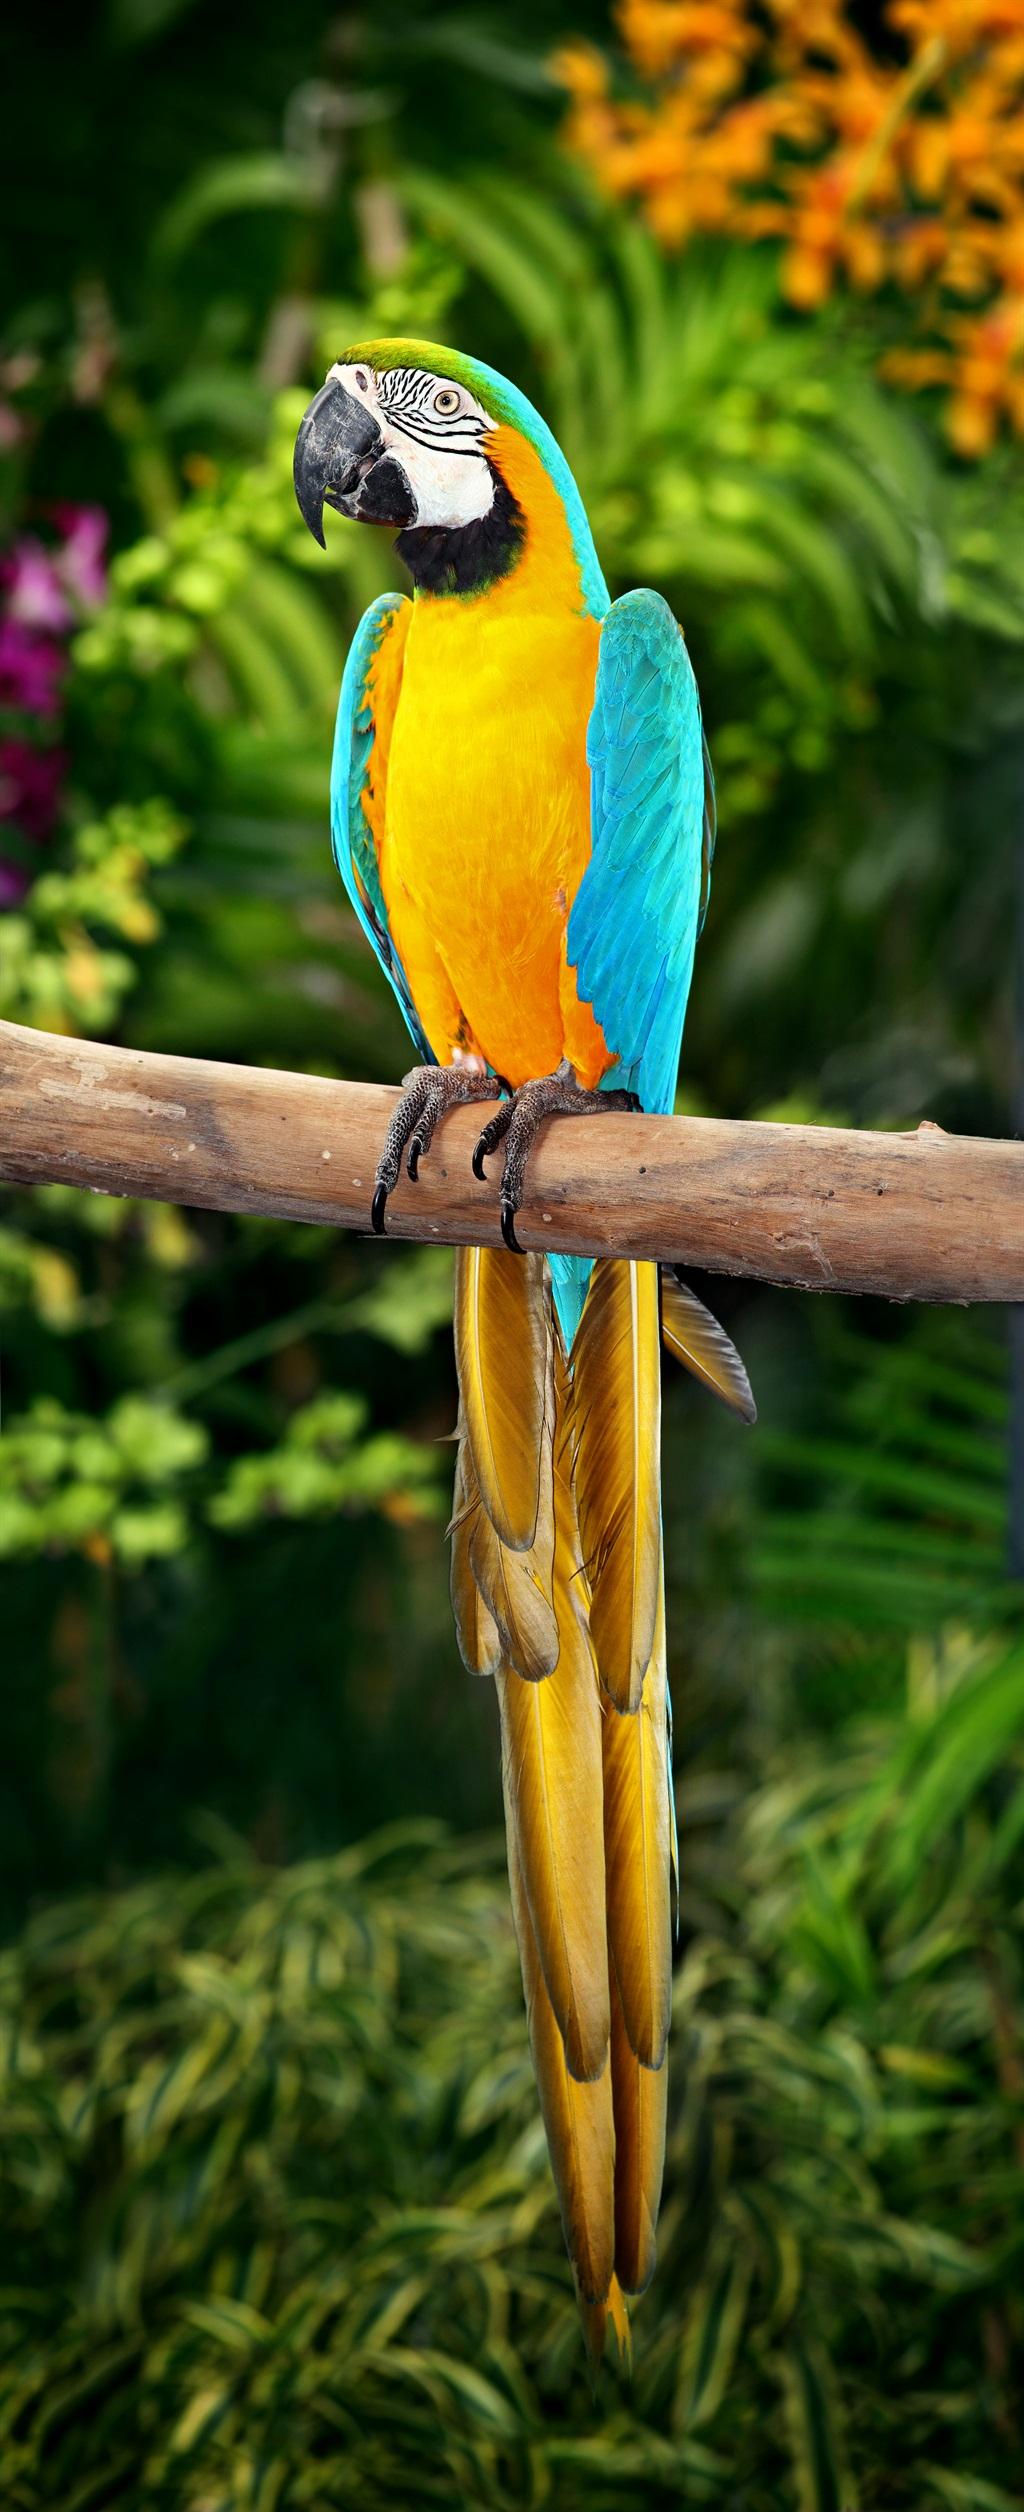 Aras is kleurvolle papegaaie. Foto: Gallo Images/Getty Images